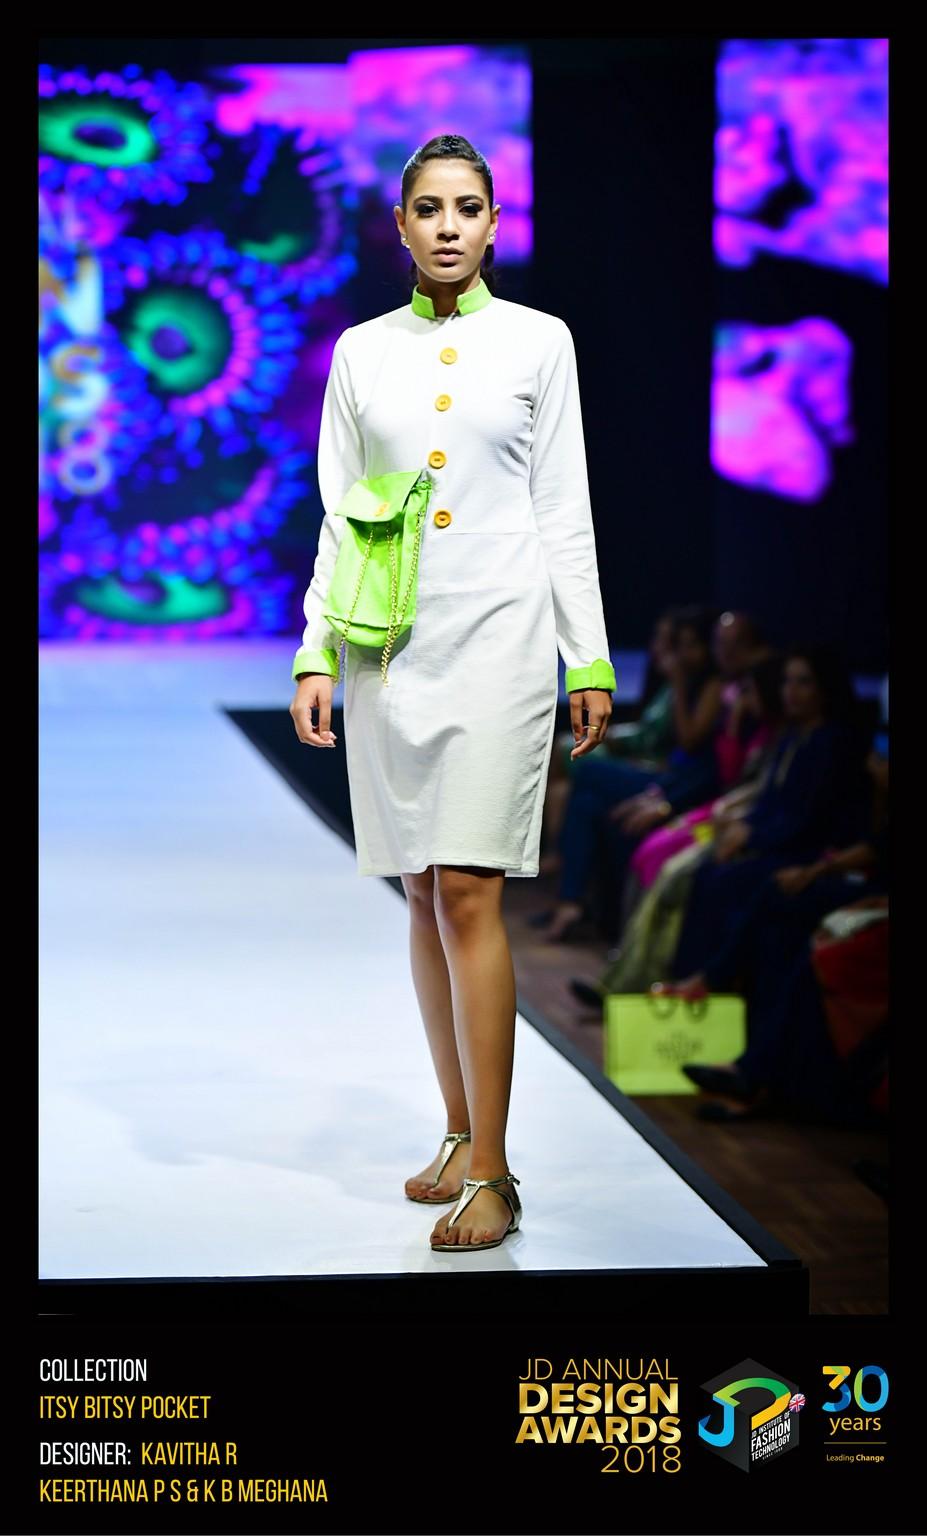 Itsy Bitsy Pocket Dress – Change – JD Annual Design Awards 2018   Designer: Kavitha, Keertana and Meghana   Photography : Jerin Nath (@jerin_nath) itsy bitsy pocket dress Itsy Bitsy Pocket Dress – Change – JD Annual Design Awards 2018 ITSY BITSY POCKET2